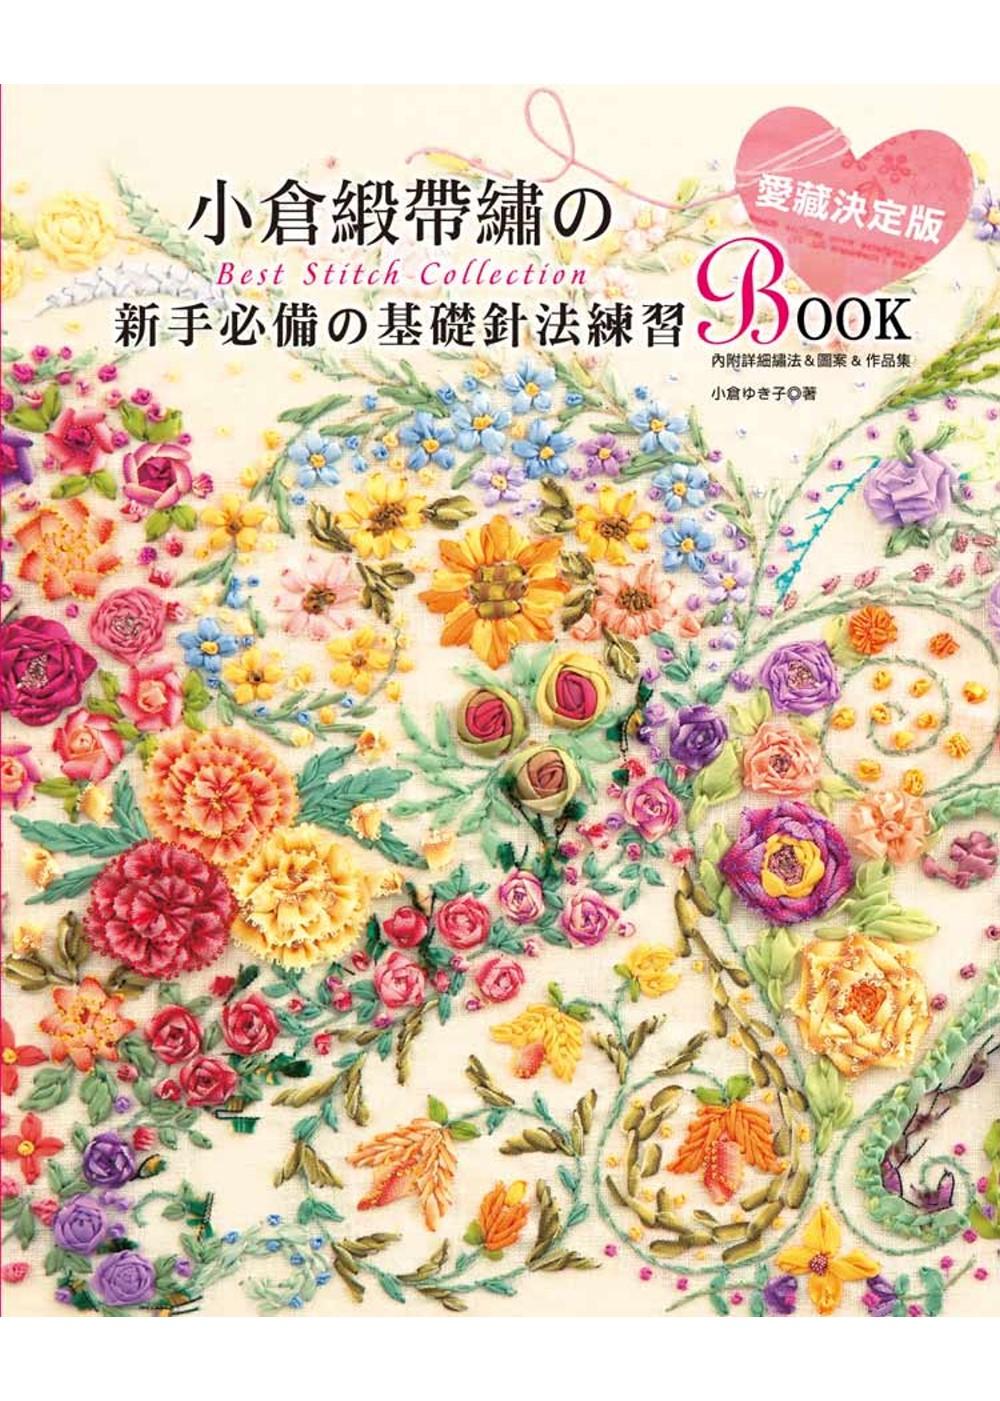 小倉緞帶繡のBest Stitch Collection:愛藏決定版!新手必備の基礎針法練習BOOK